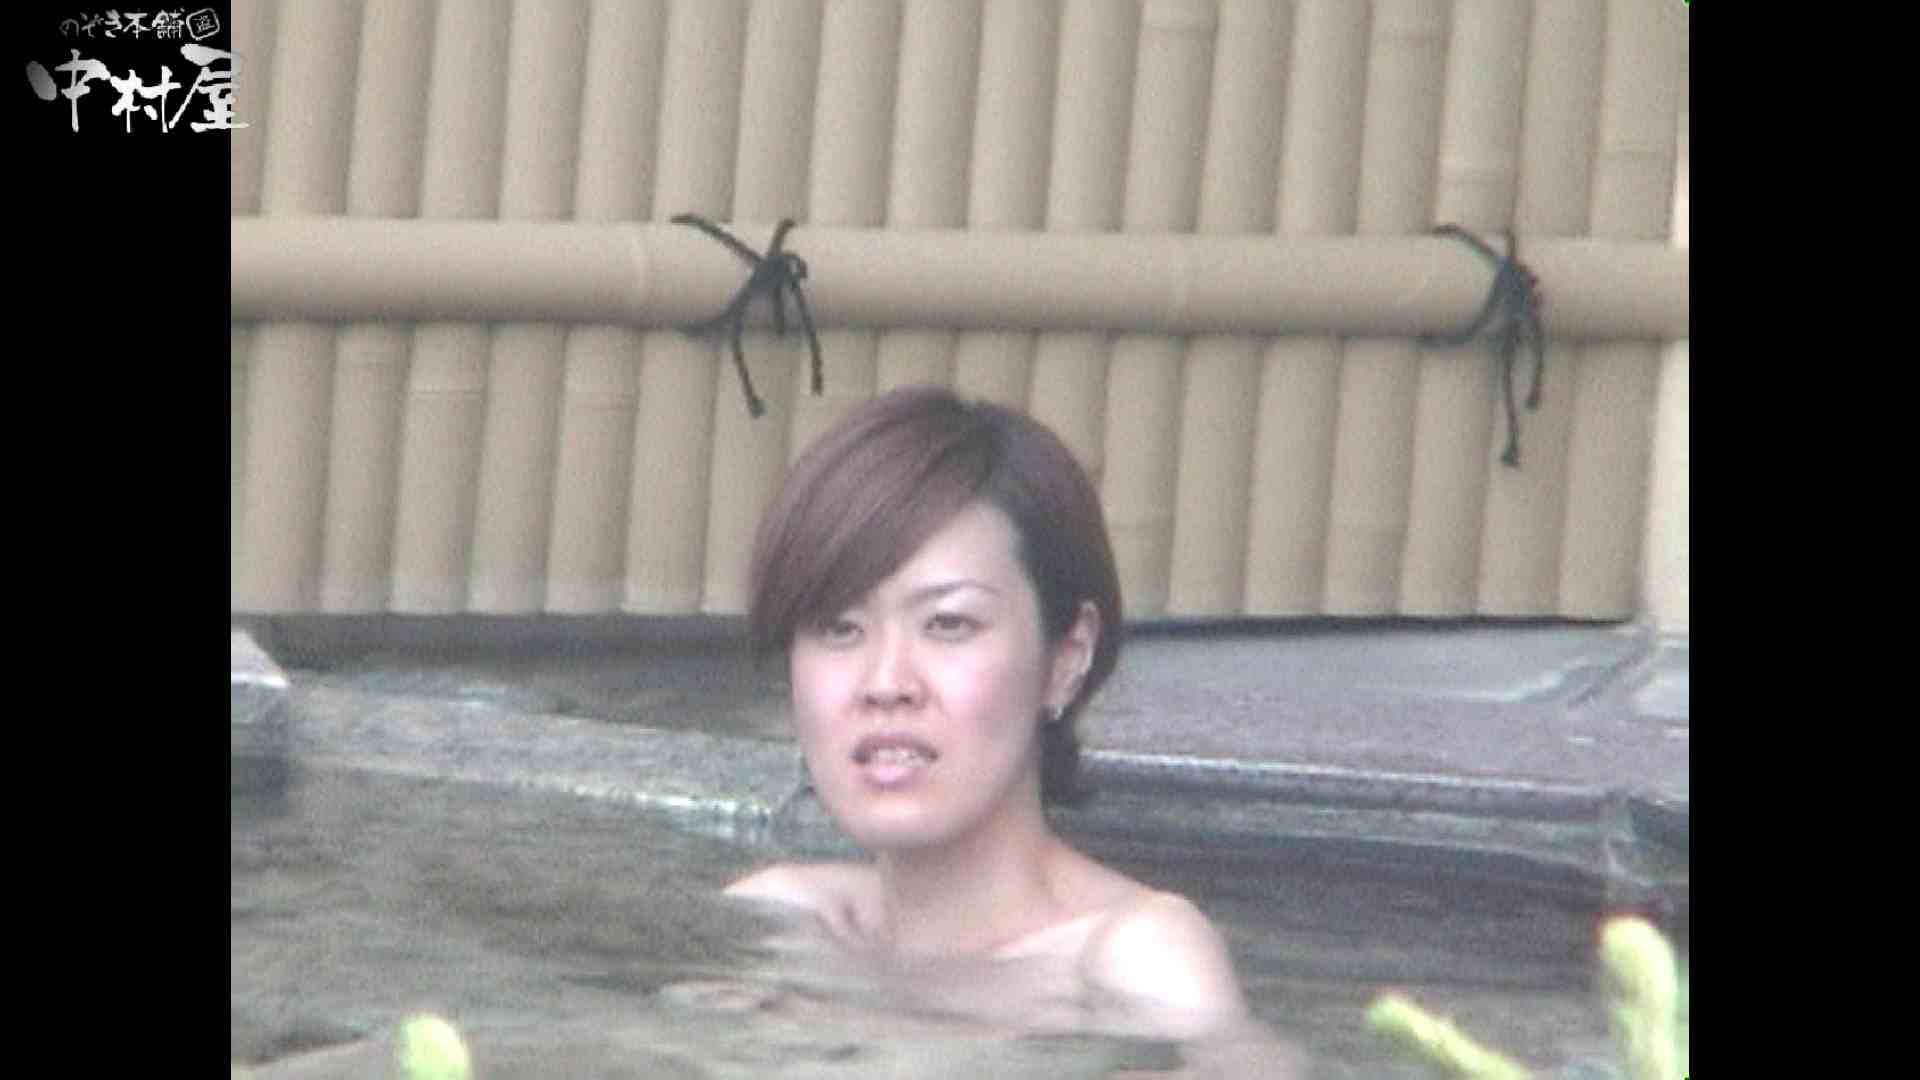 Aquaな露天風呂Vol.961 OL女体  65連発 48